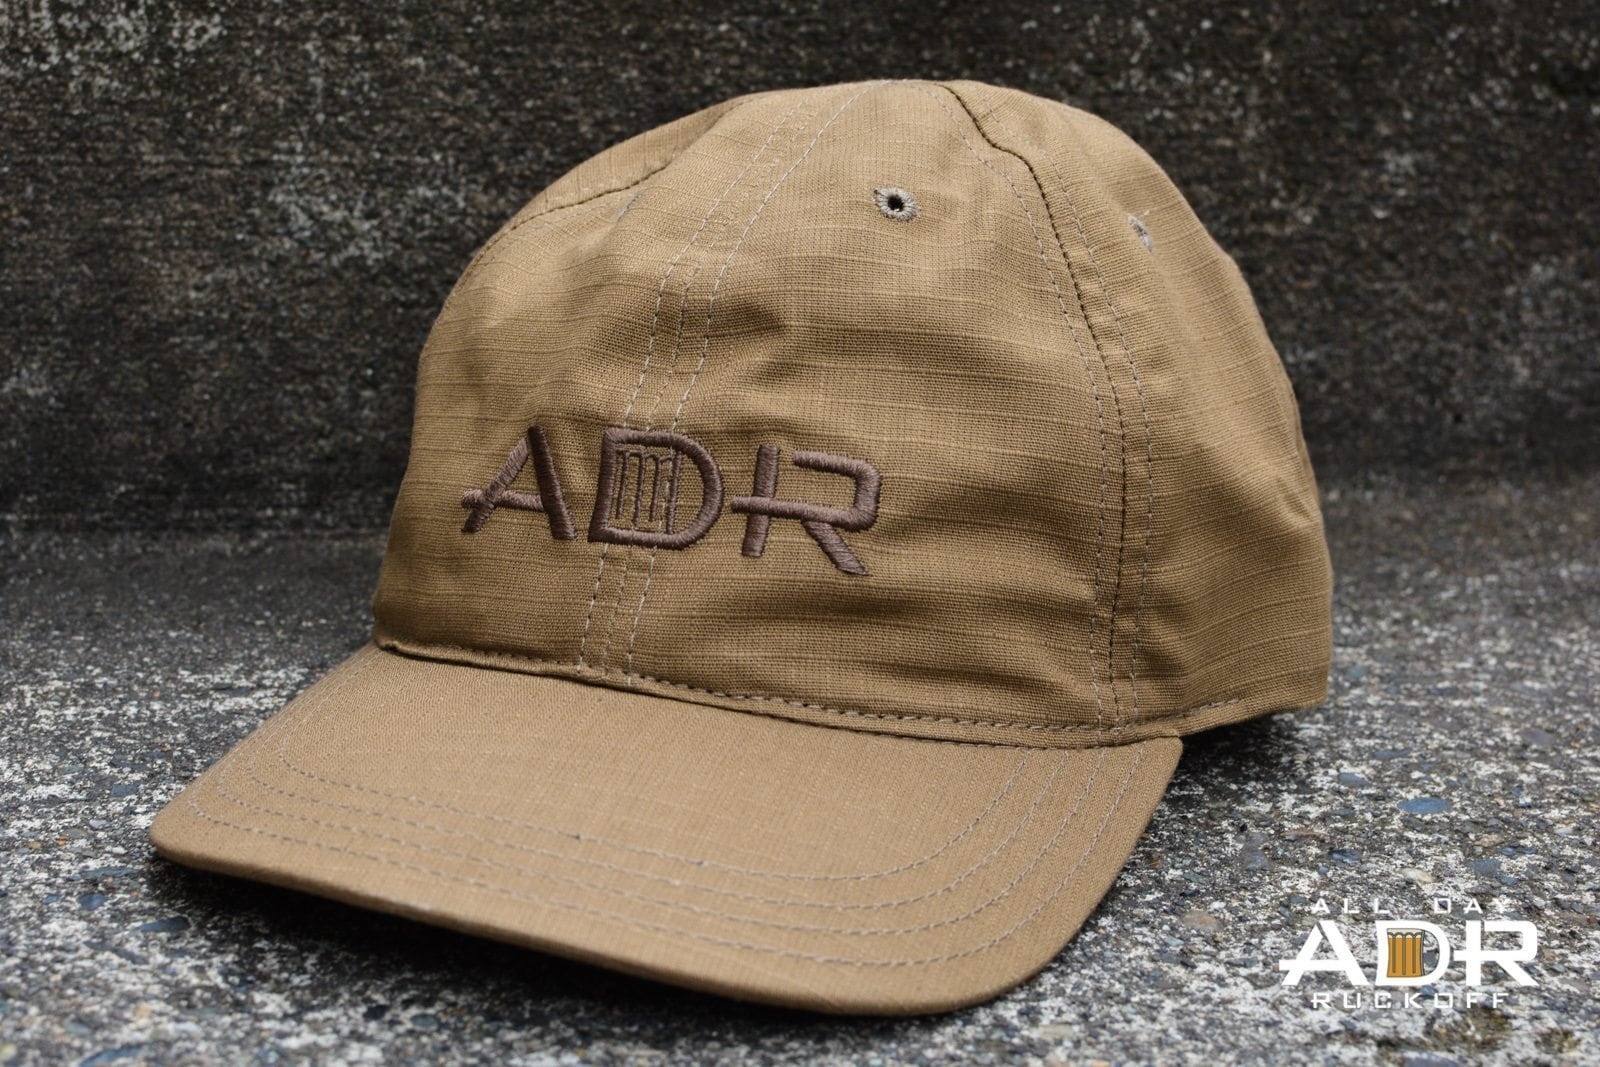 GORUCK ADR Tac Hat Coyote Wide